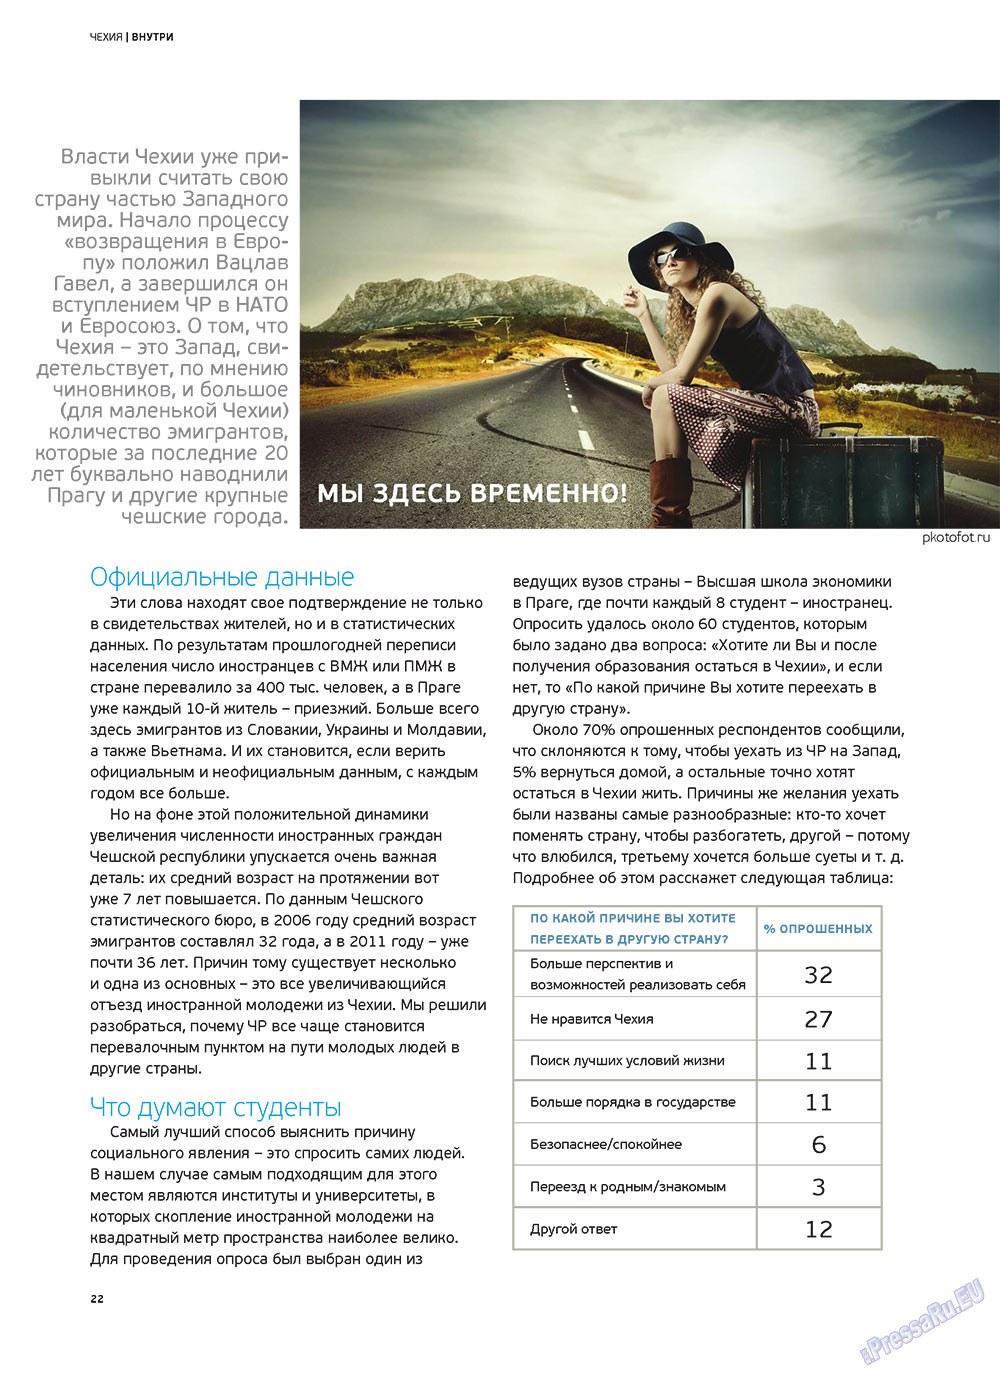 Артек (журнал). 2012 год, номер 2, стр. 24